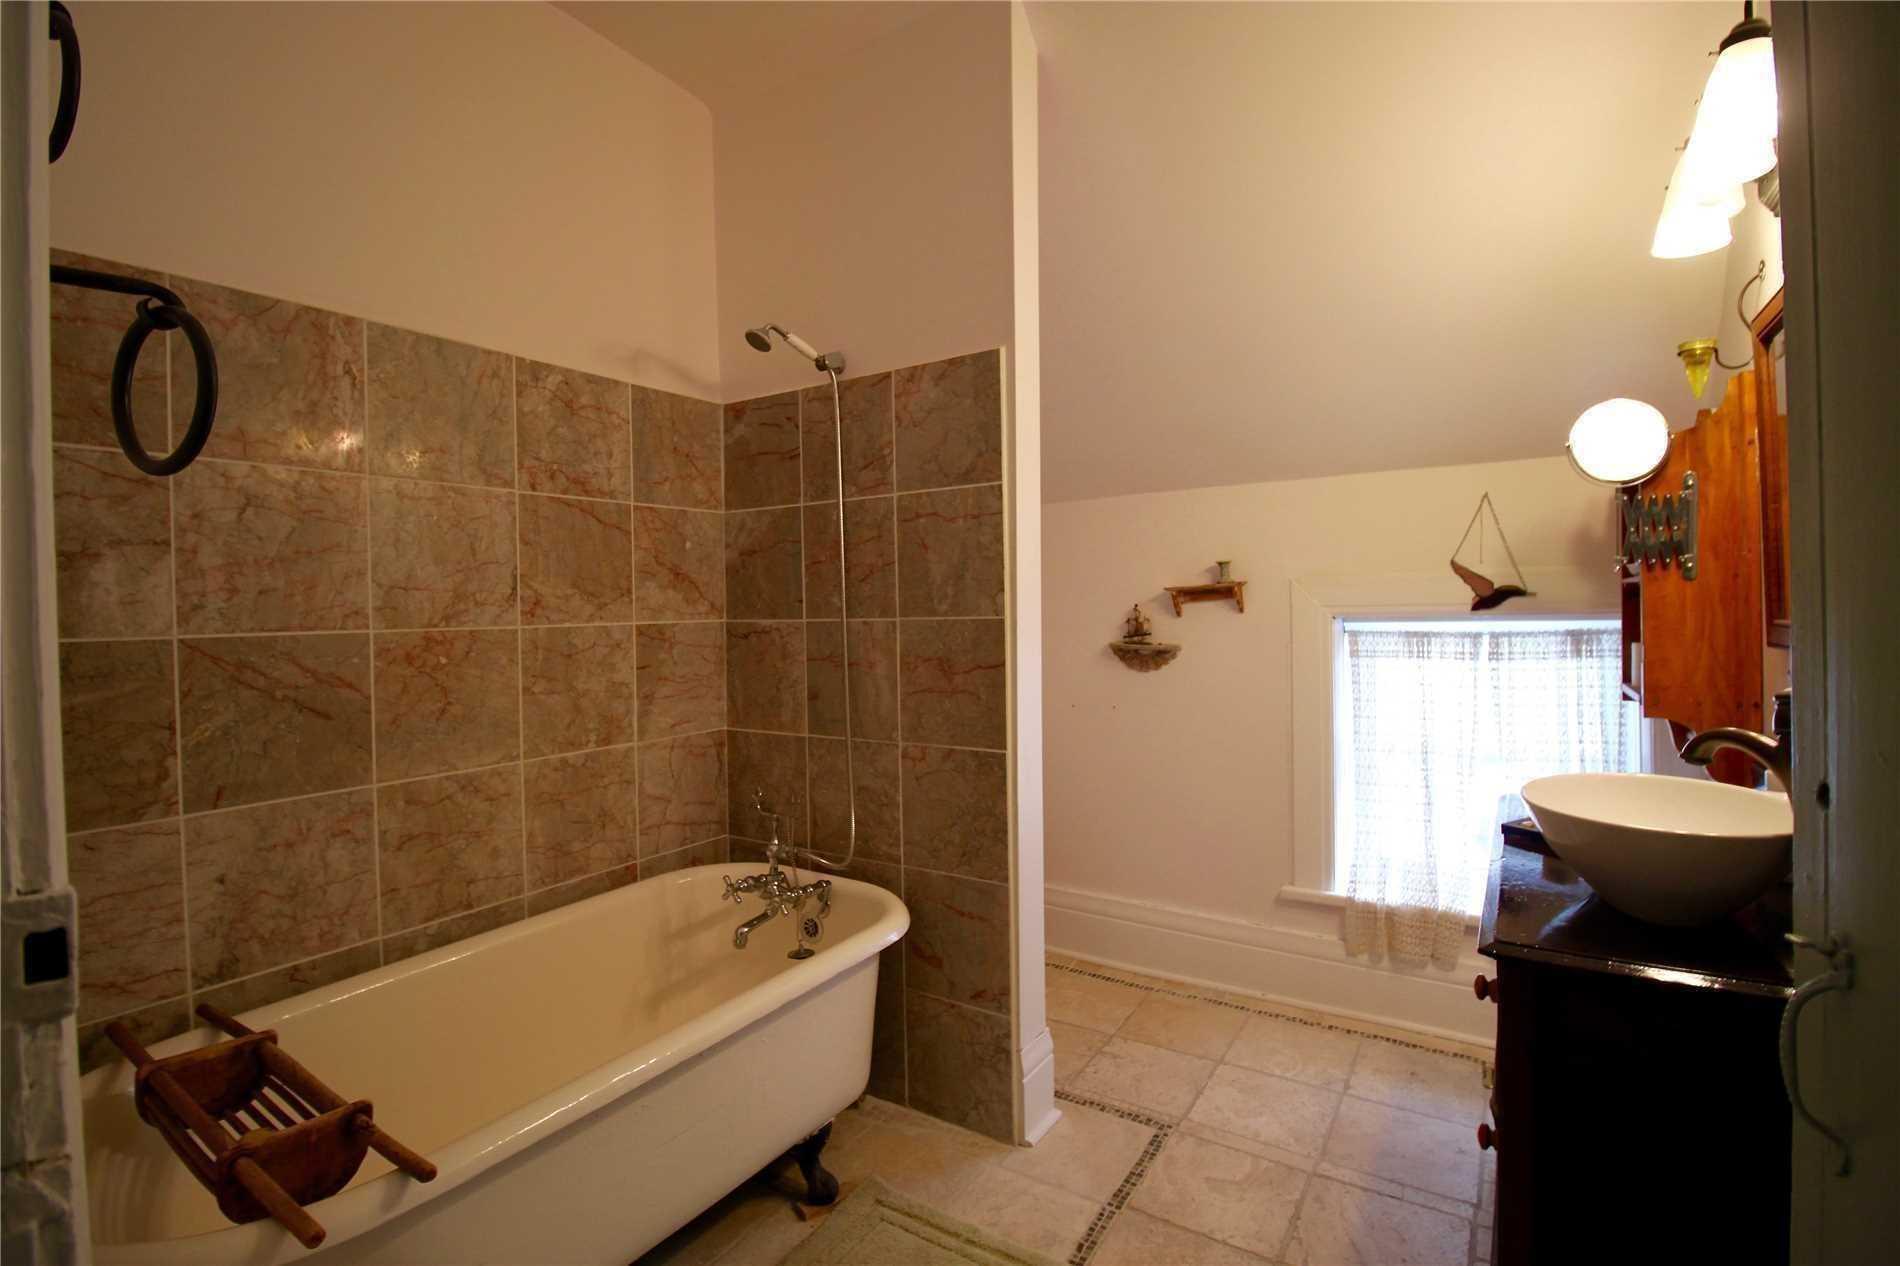 239 Champlain Rd, Penetanguishene S4659719